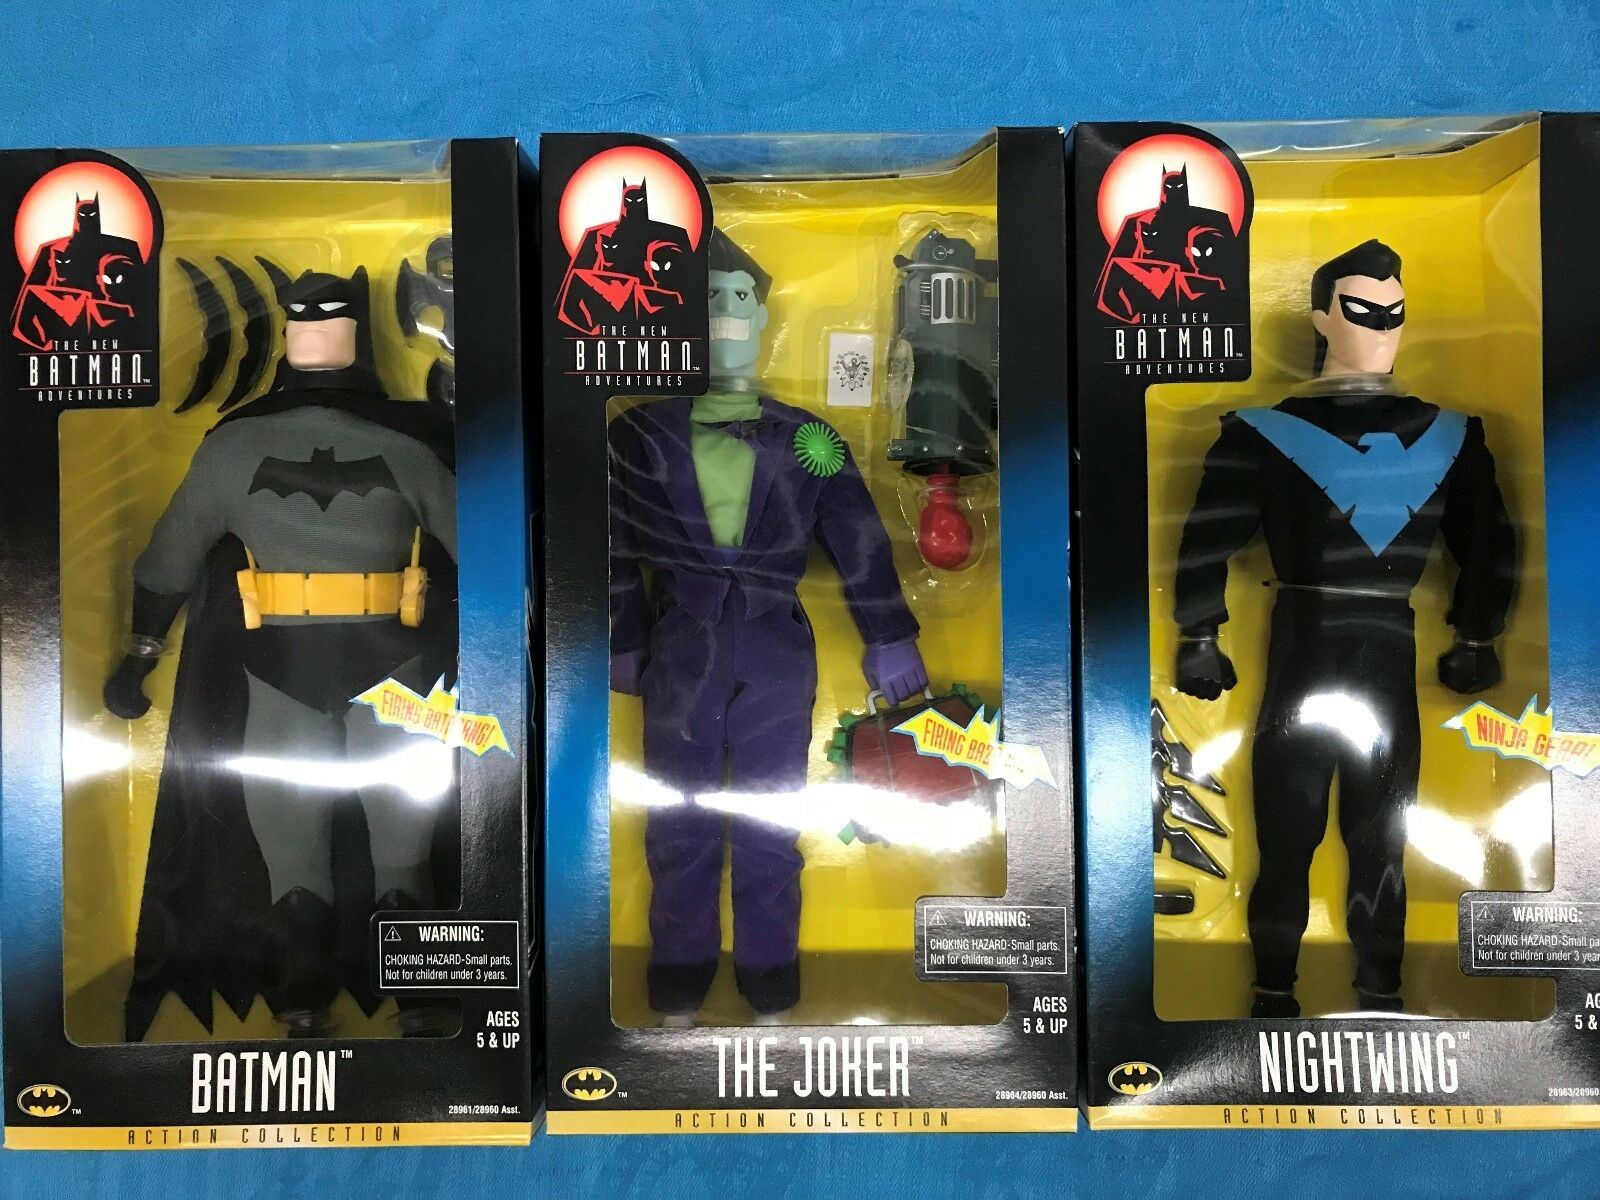 The New New New Batman Adventures set of 3 12 figures - Batman Nightwing Joker - Kenner c40142